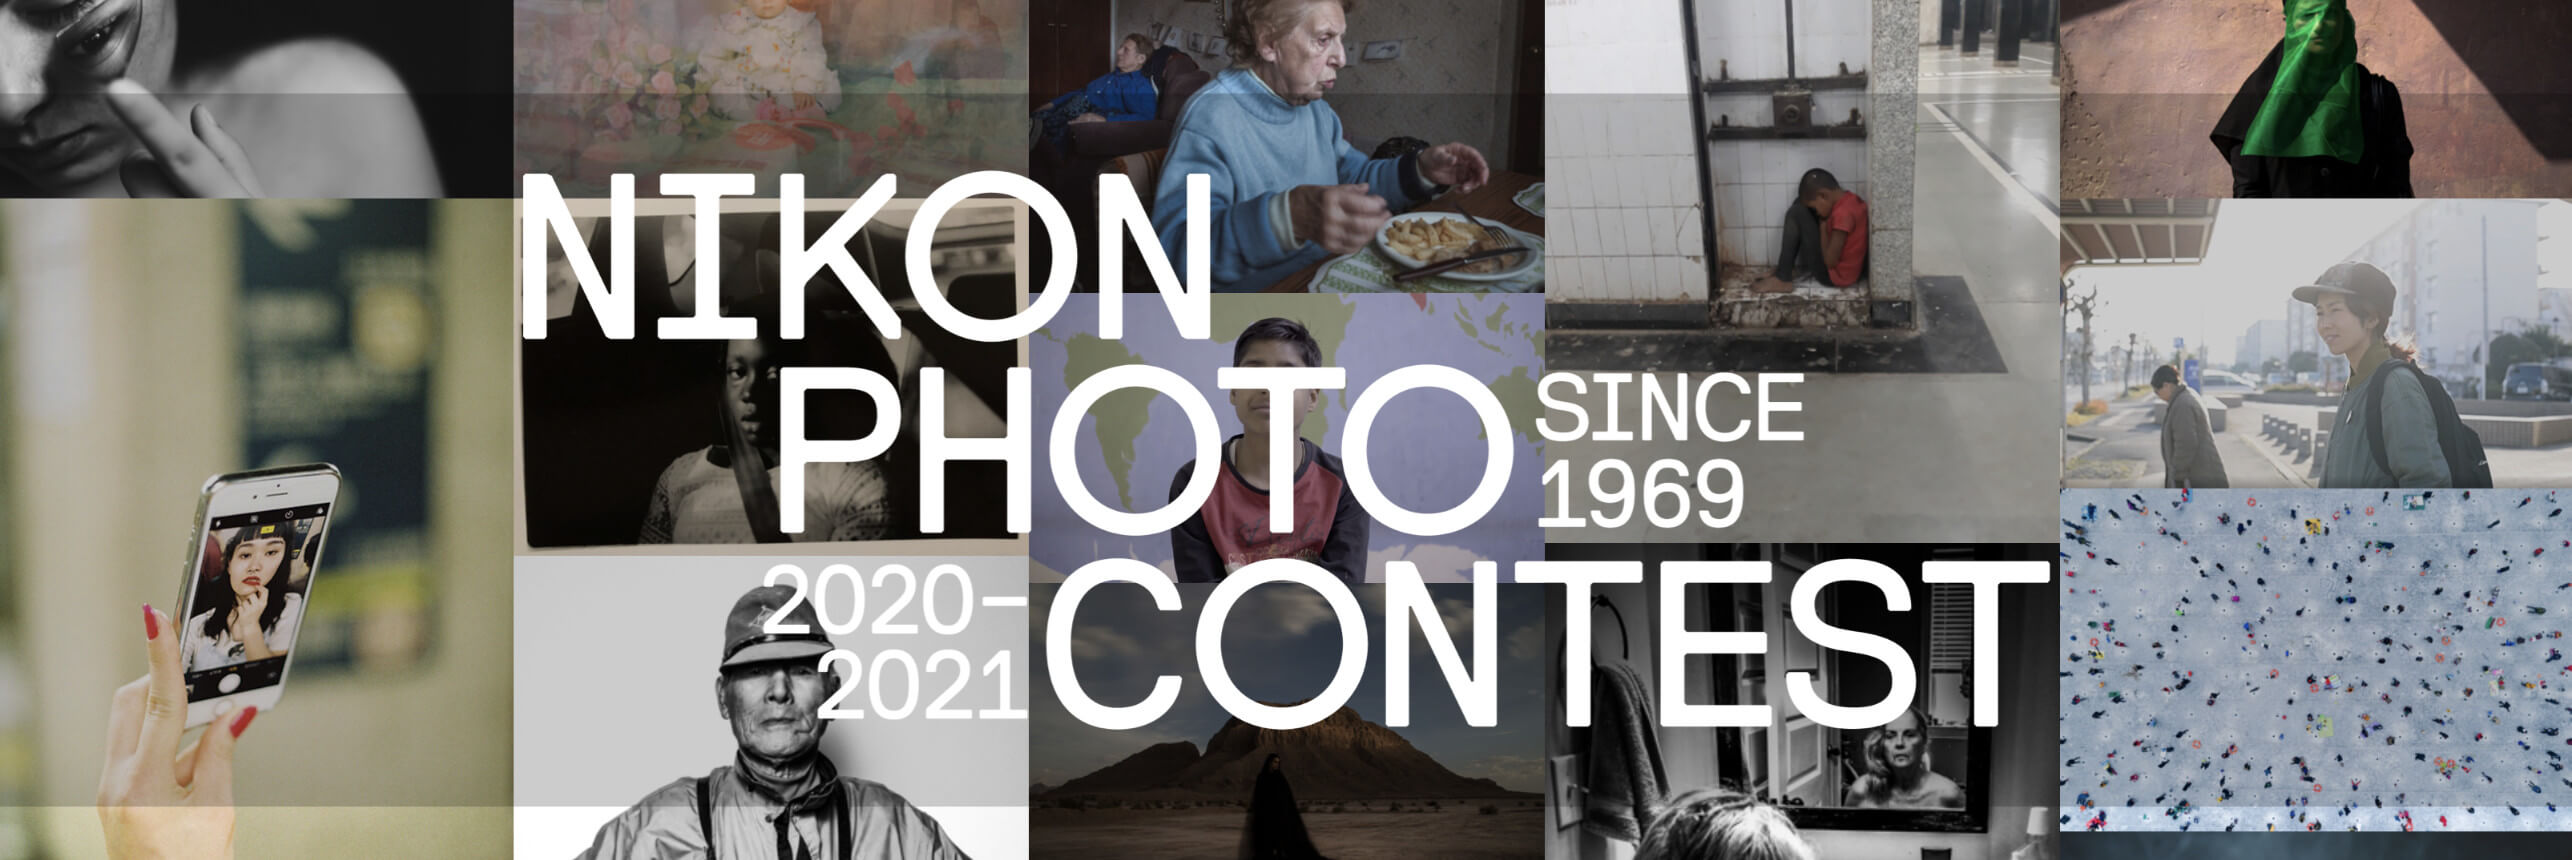 Nikon Photo Contest otevírá témata pro ročník 2020–2021